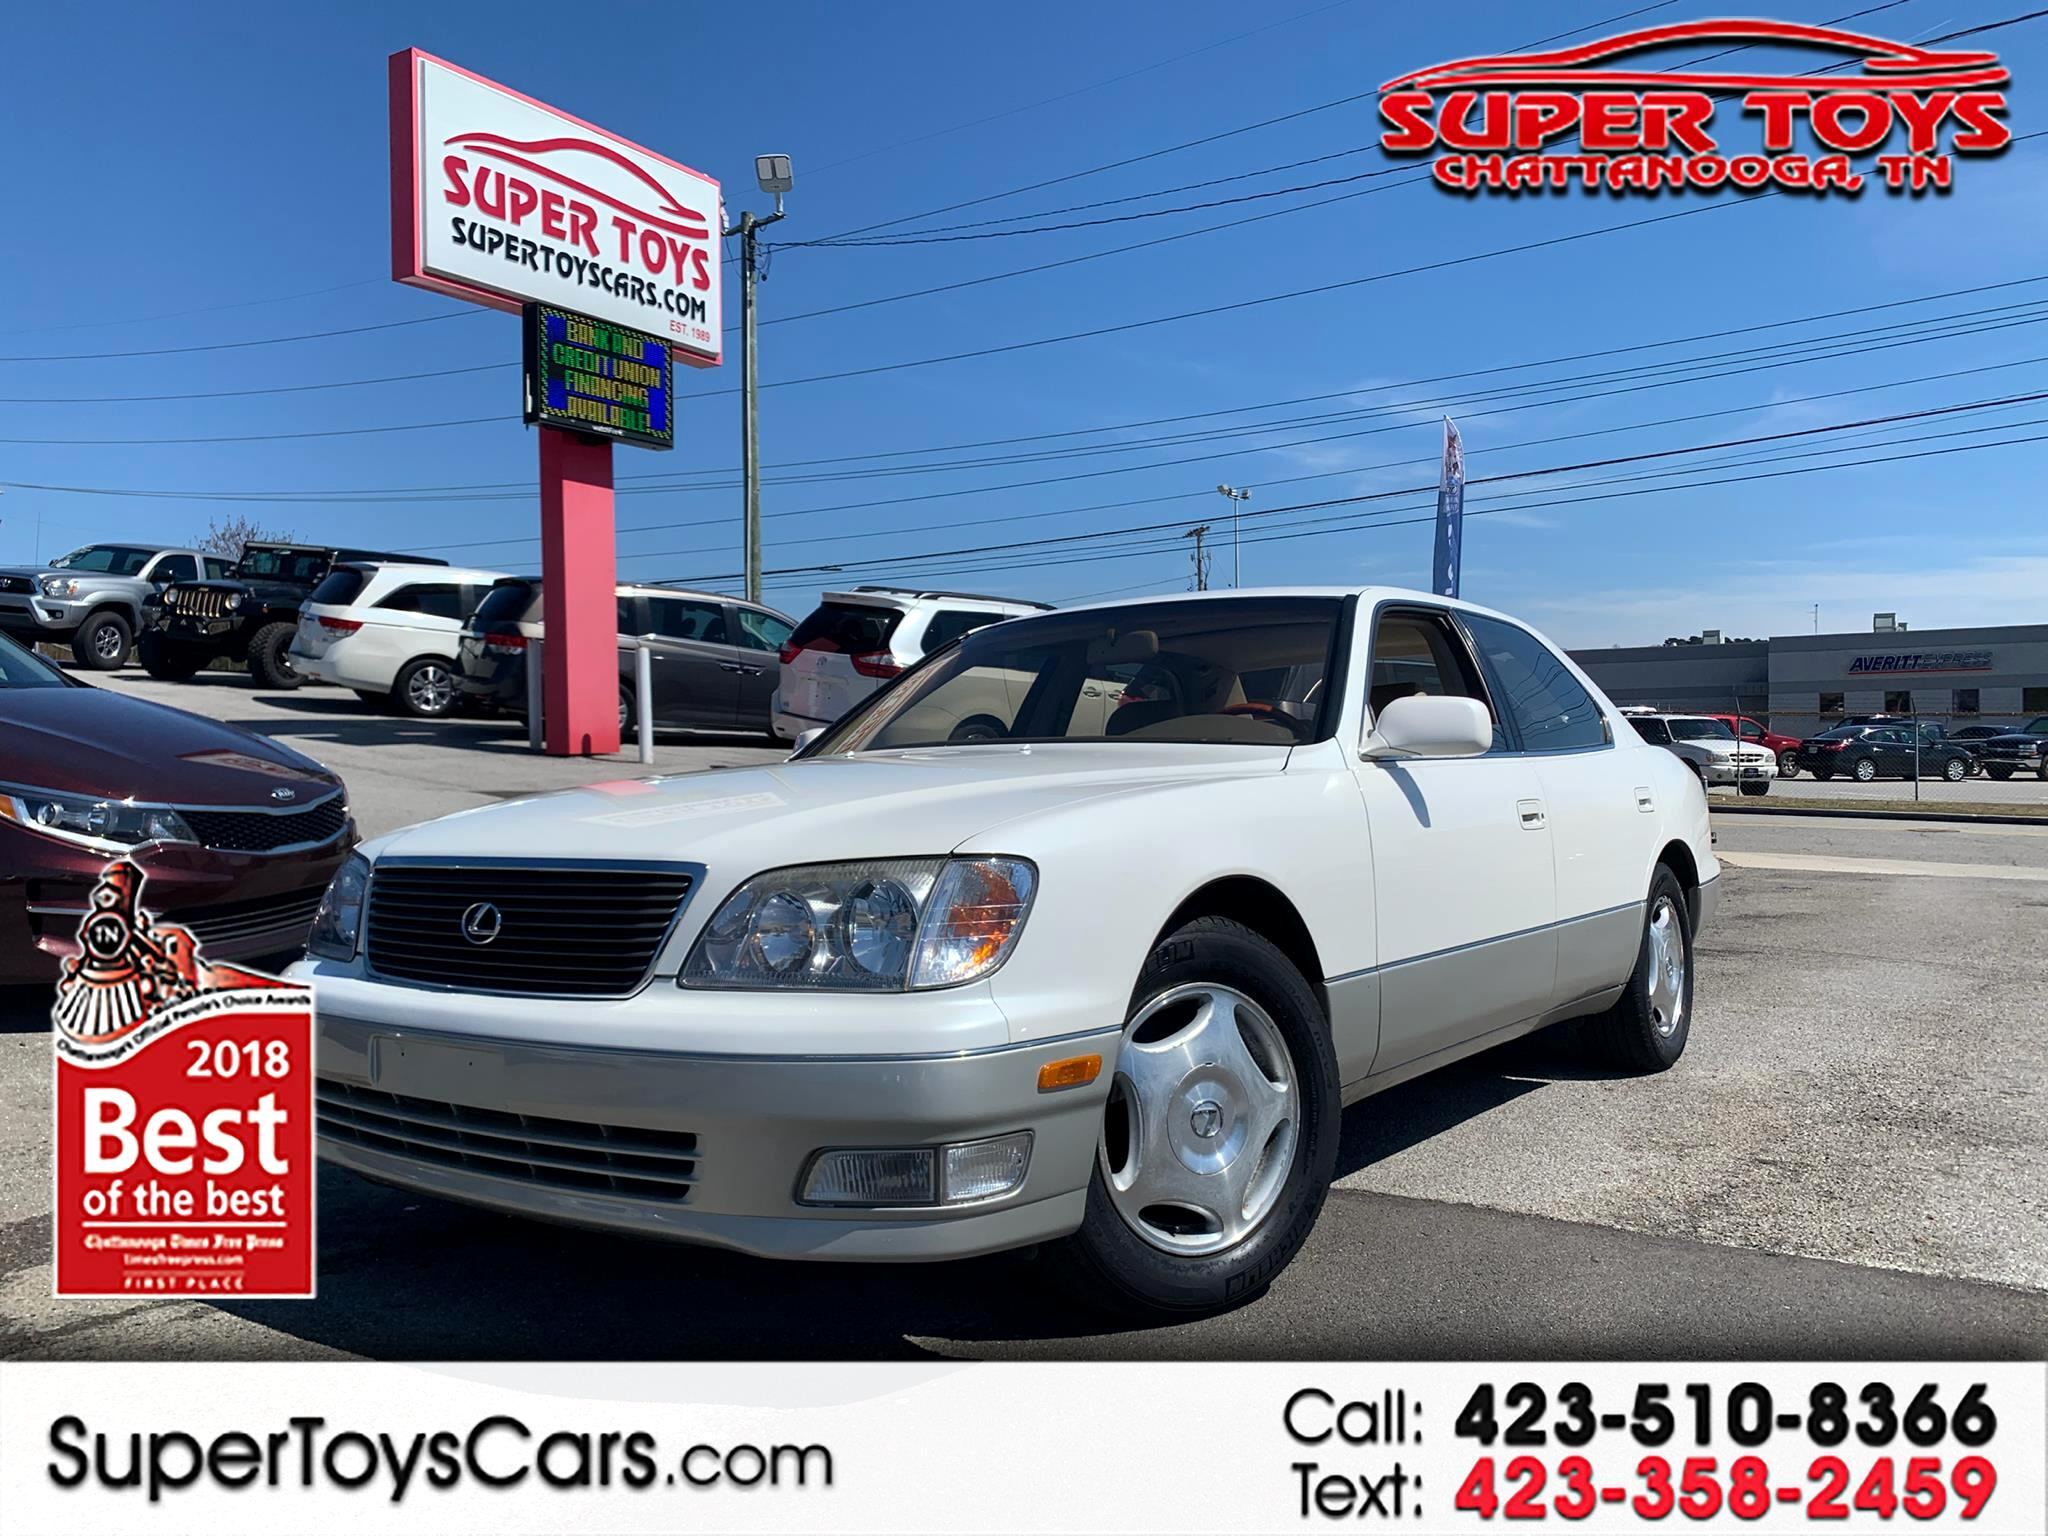 1999 Lexus LS 400 Luxury Sdn 4dr Sdn